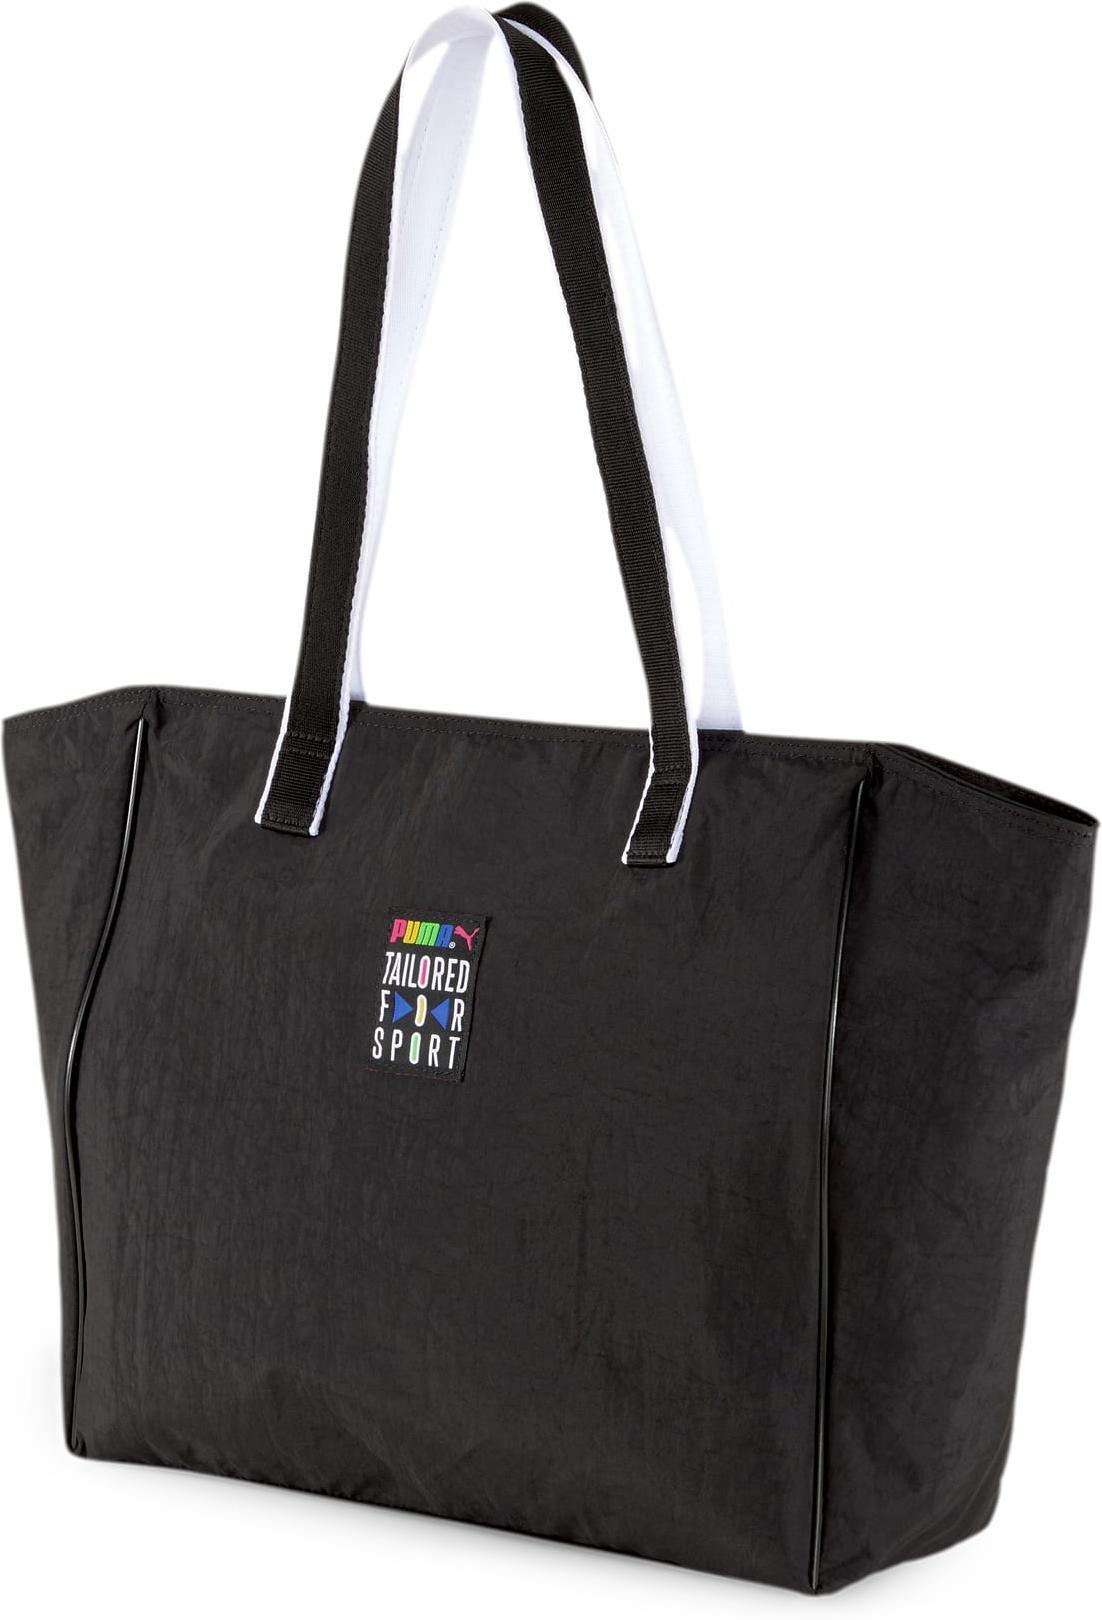 Bag Puma Prime Street Large Shopper